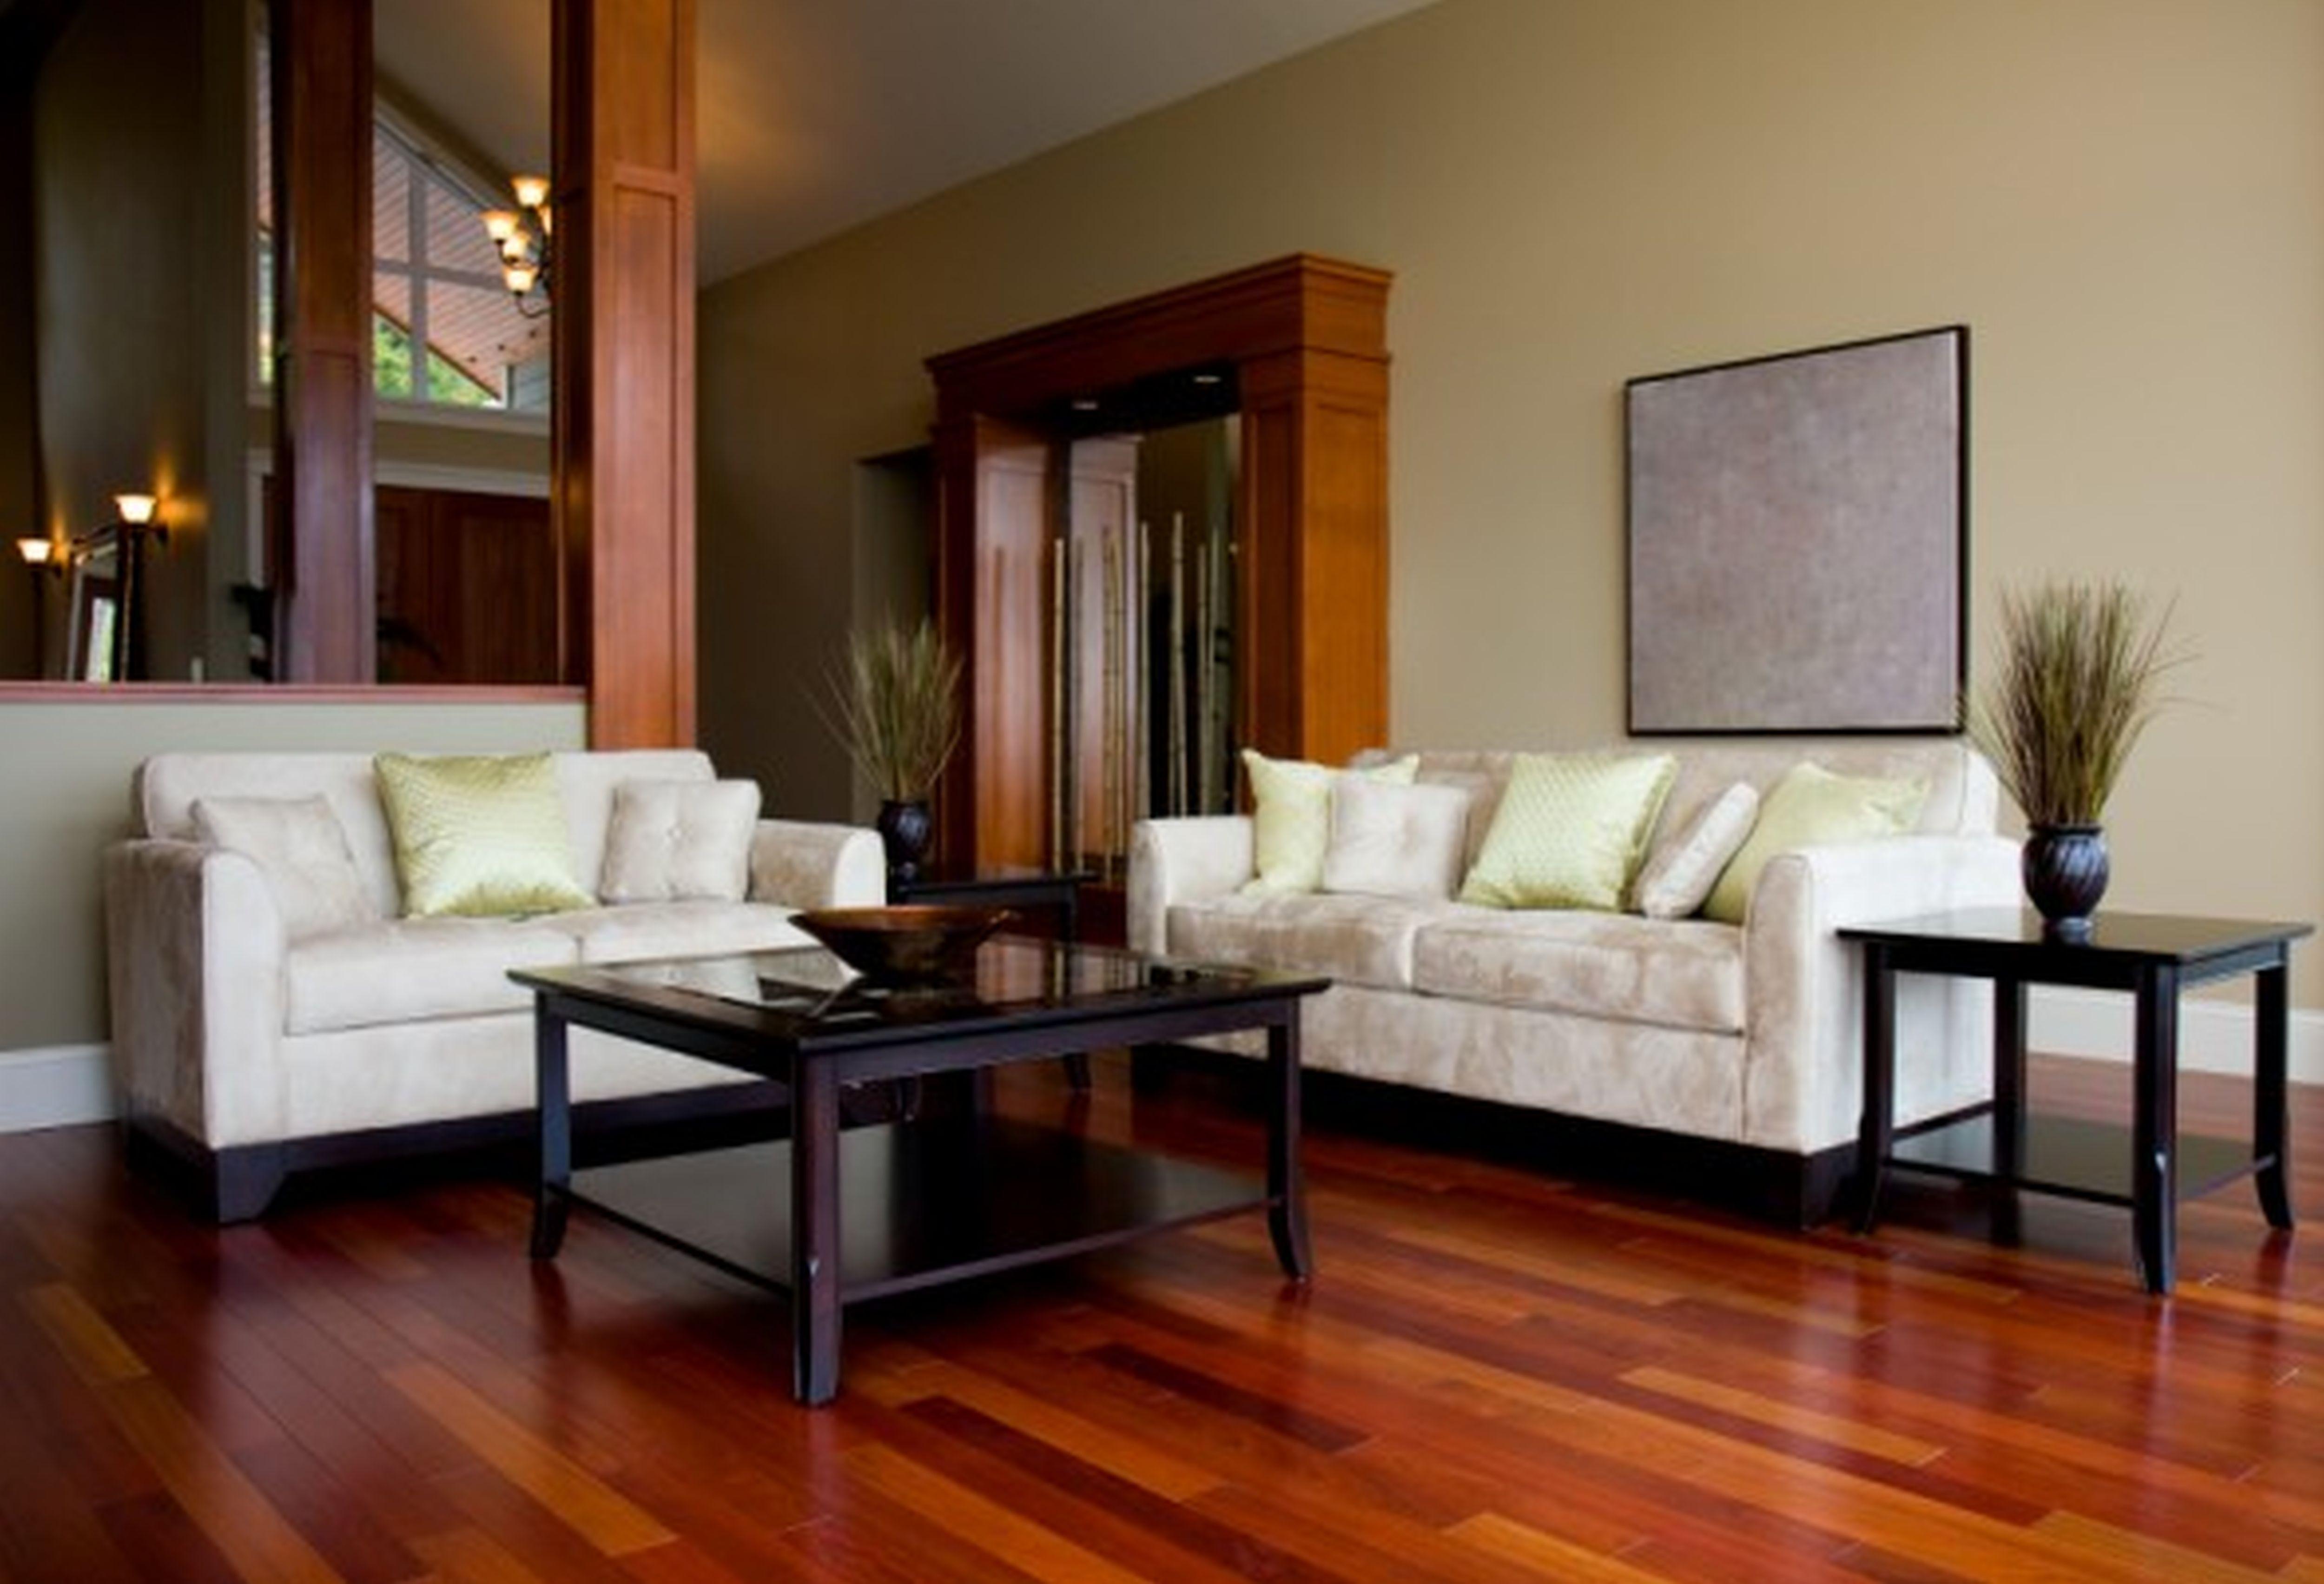 Wooden Living Room Decor Wood Living Room Interior Design Ideas - Wooden designs for living room